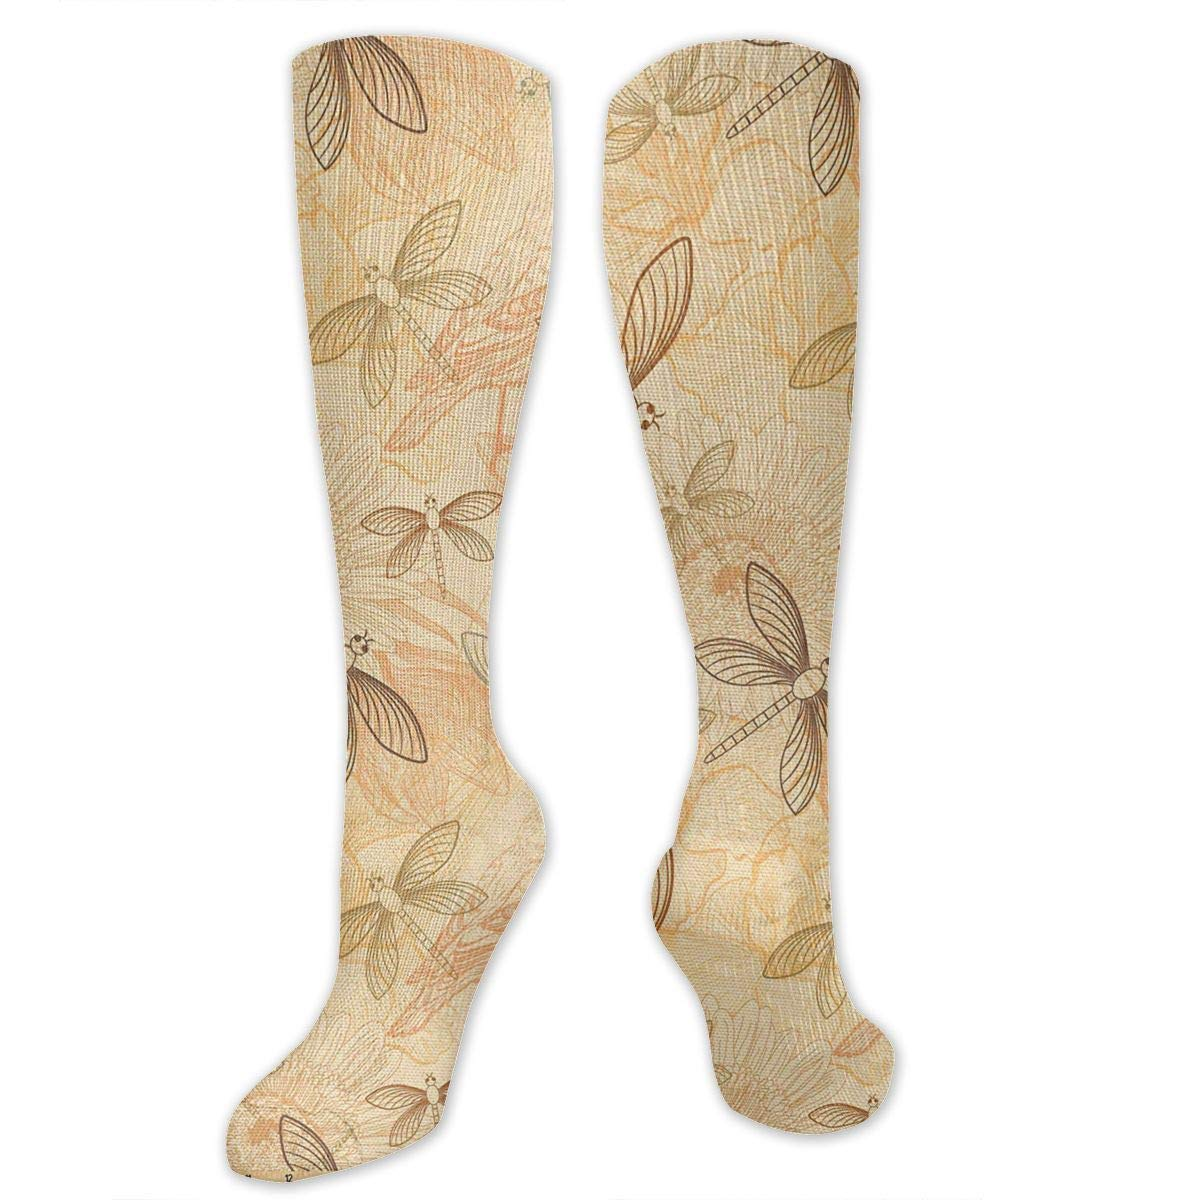 Chanwazibibiliu Vintage Birds and Dragonflies Mens Colorful Dress Socks Funky Men Multicolored Pattern Fashionable Fun Crew Cotton Socks